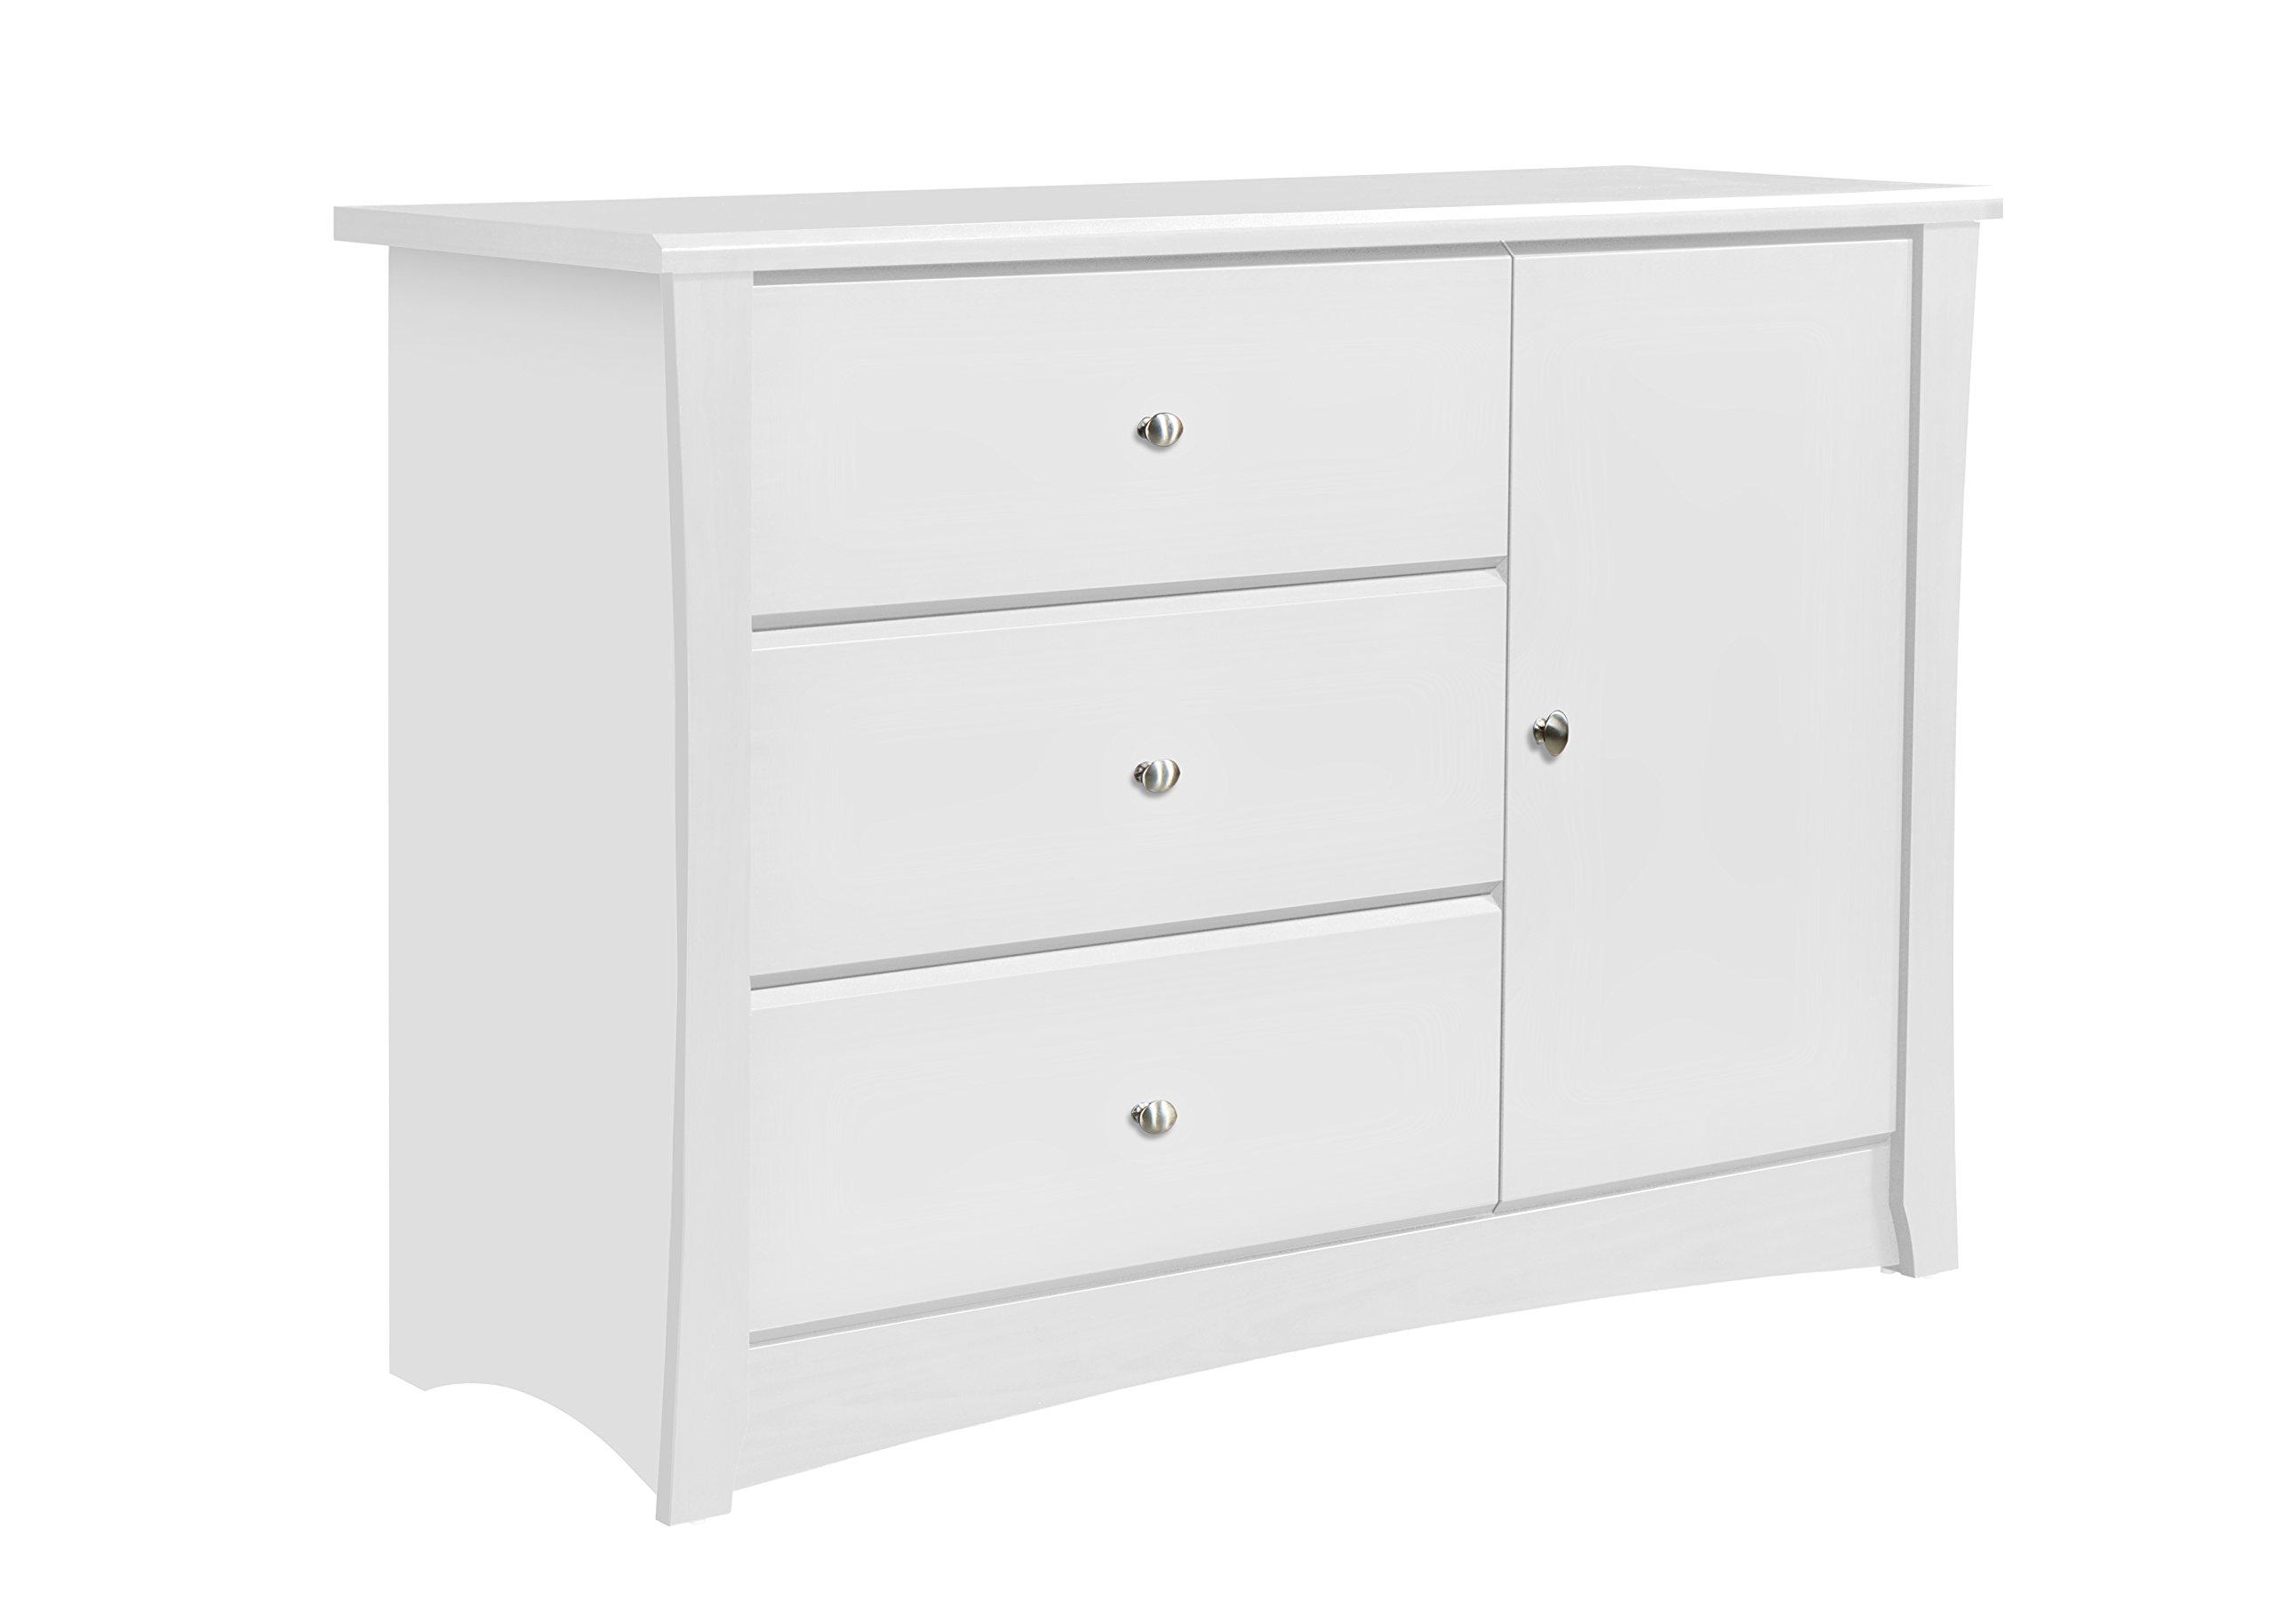 Storkcraft Crescent 3 Drawer Combo Dresser, White by Stork Craft (Image #1)